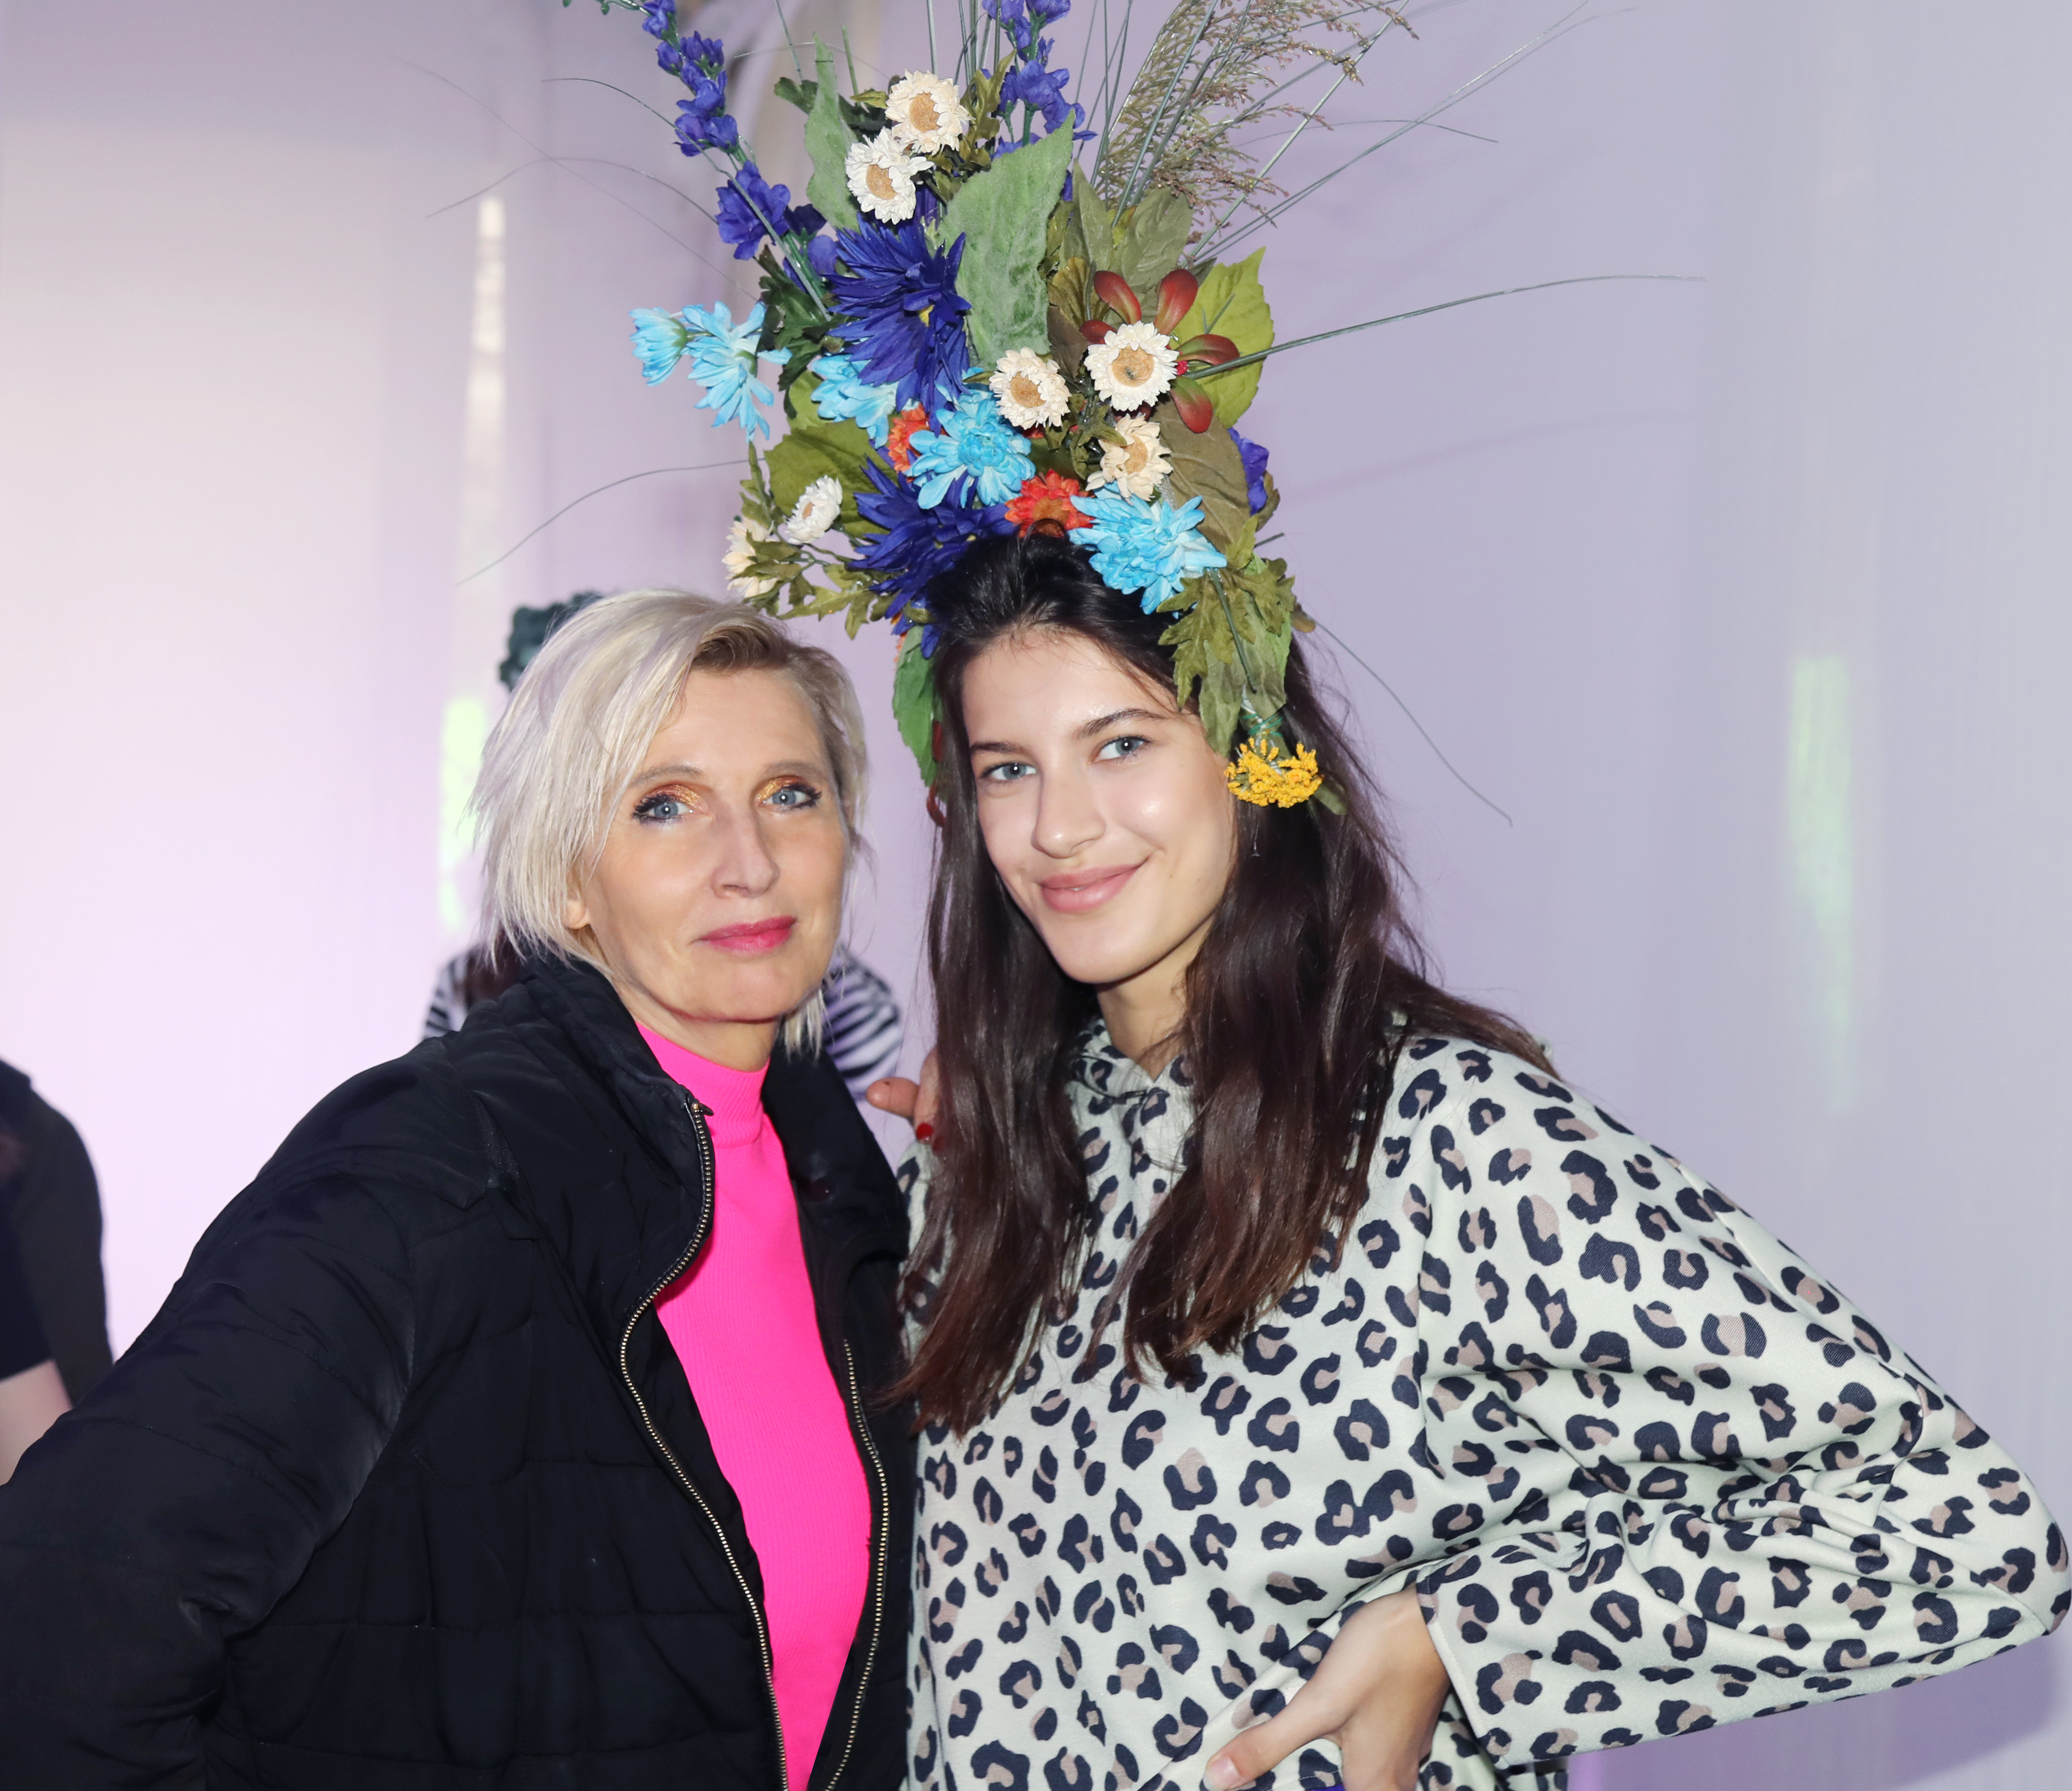 Tatras printemps été 2019 2020